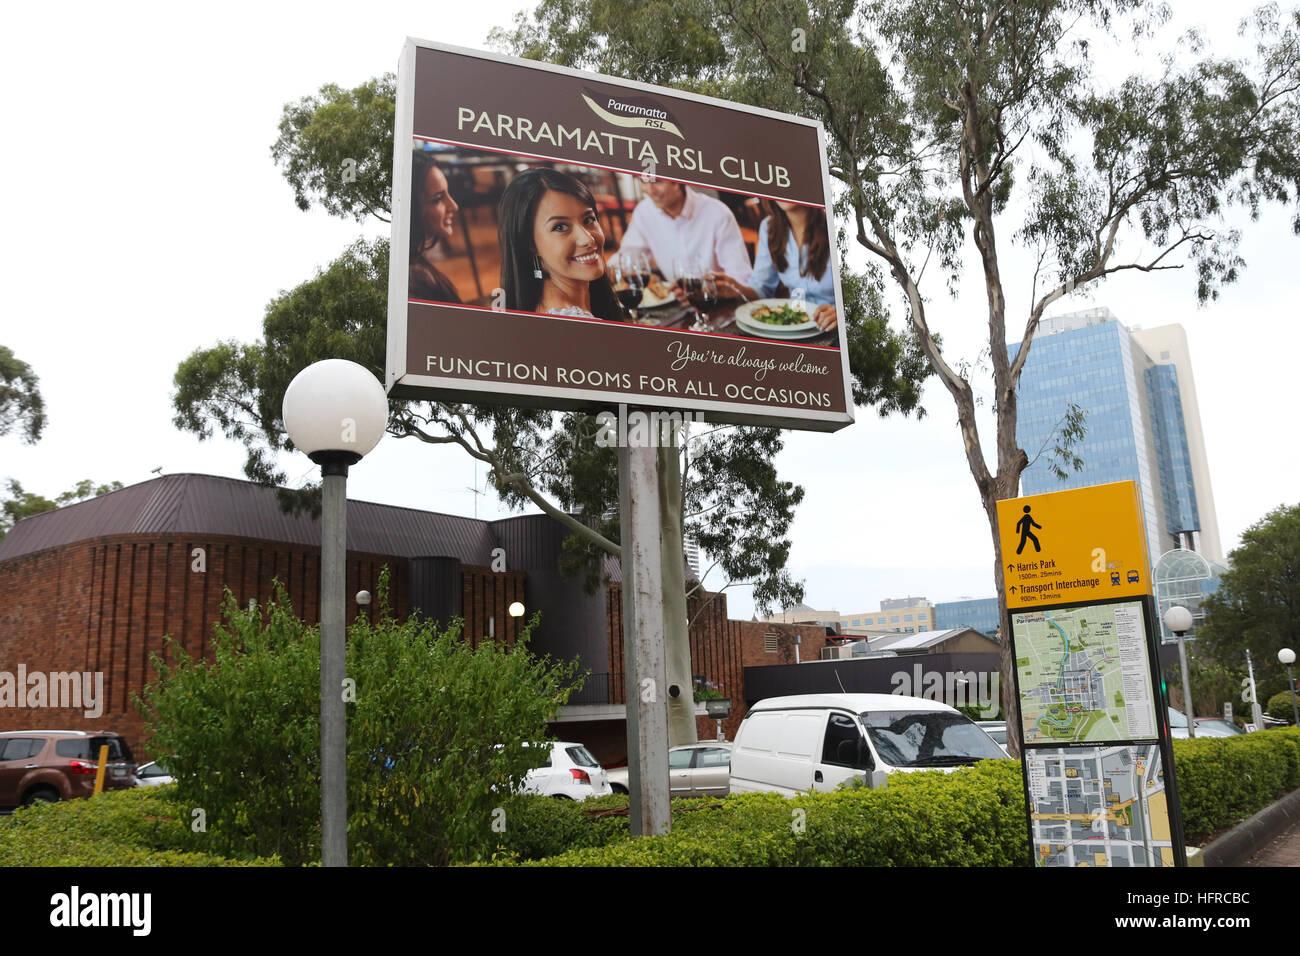 Parramatta RSL Club in Western Sydney, Australia. - Stock Image